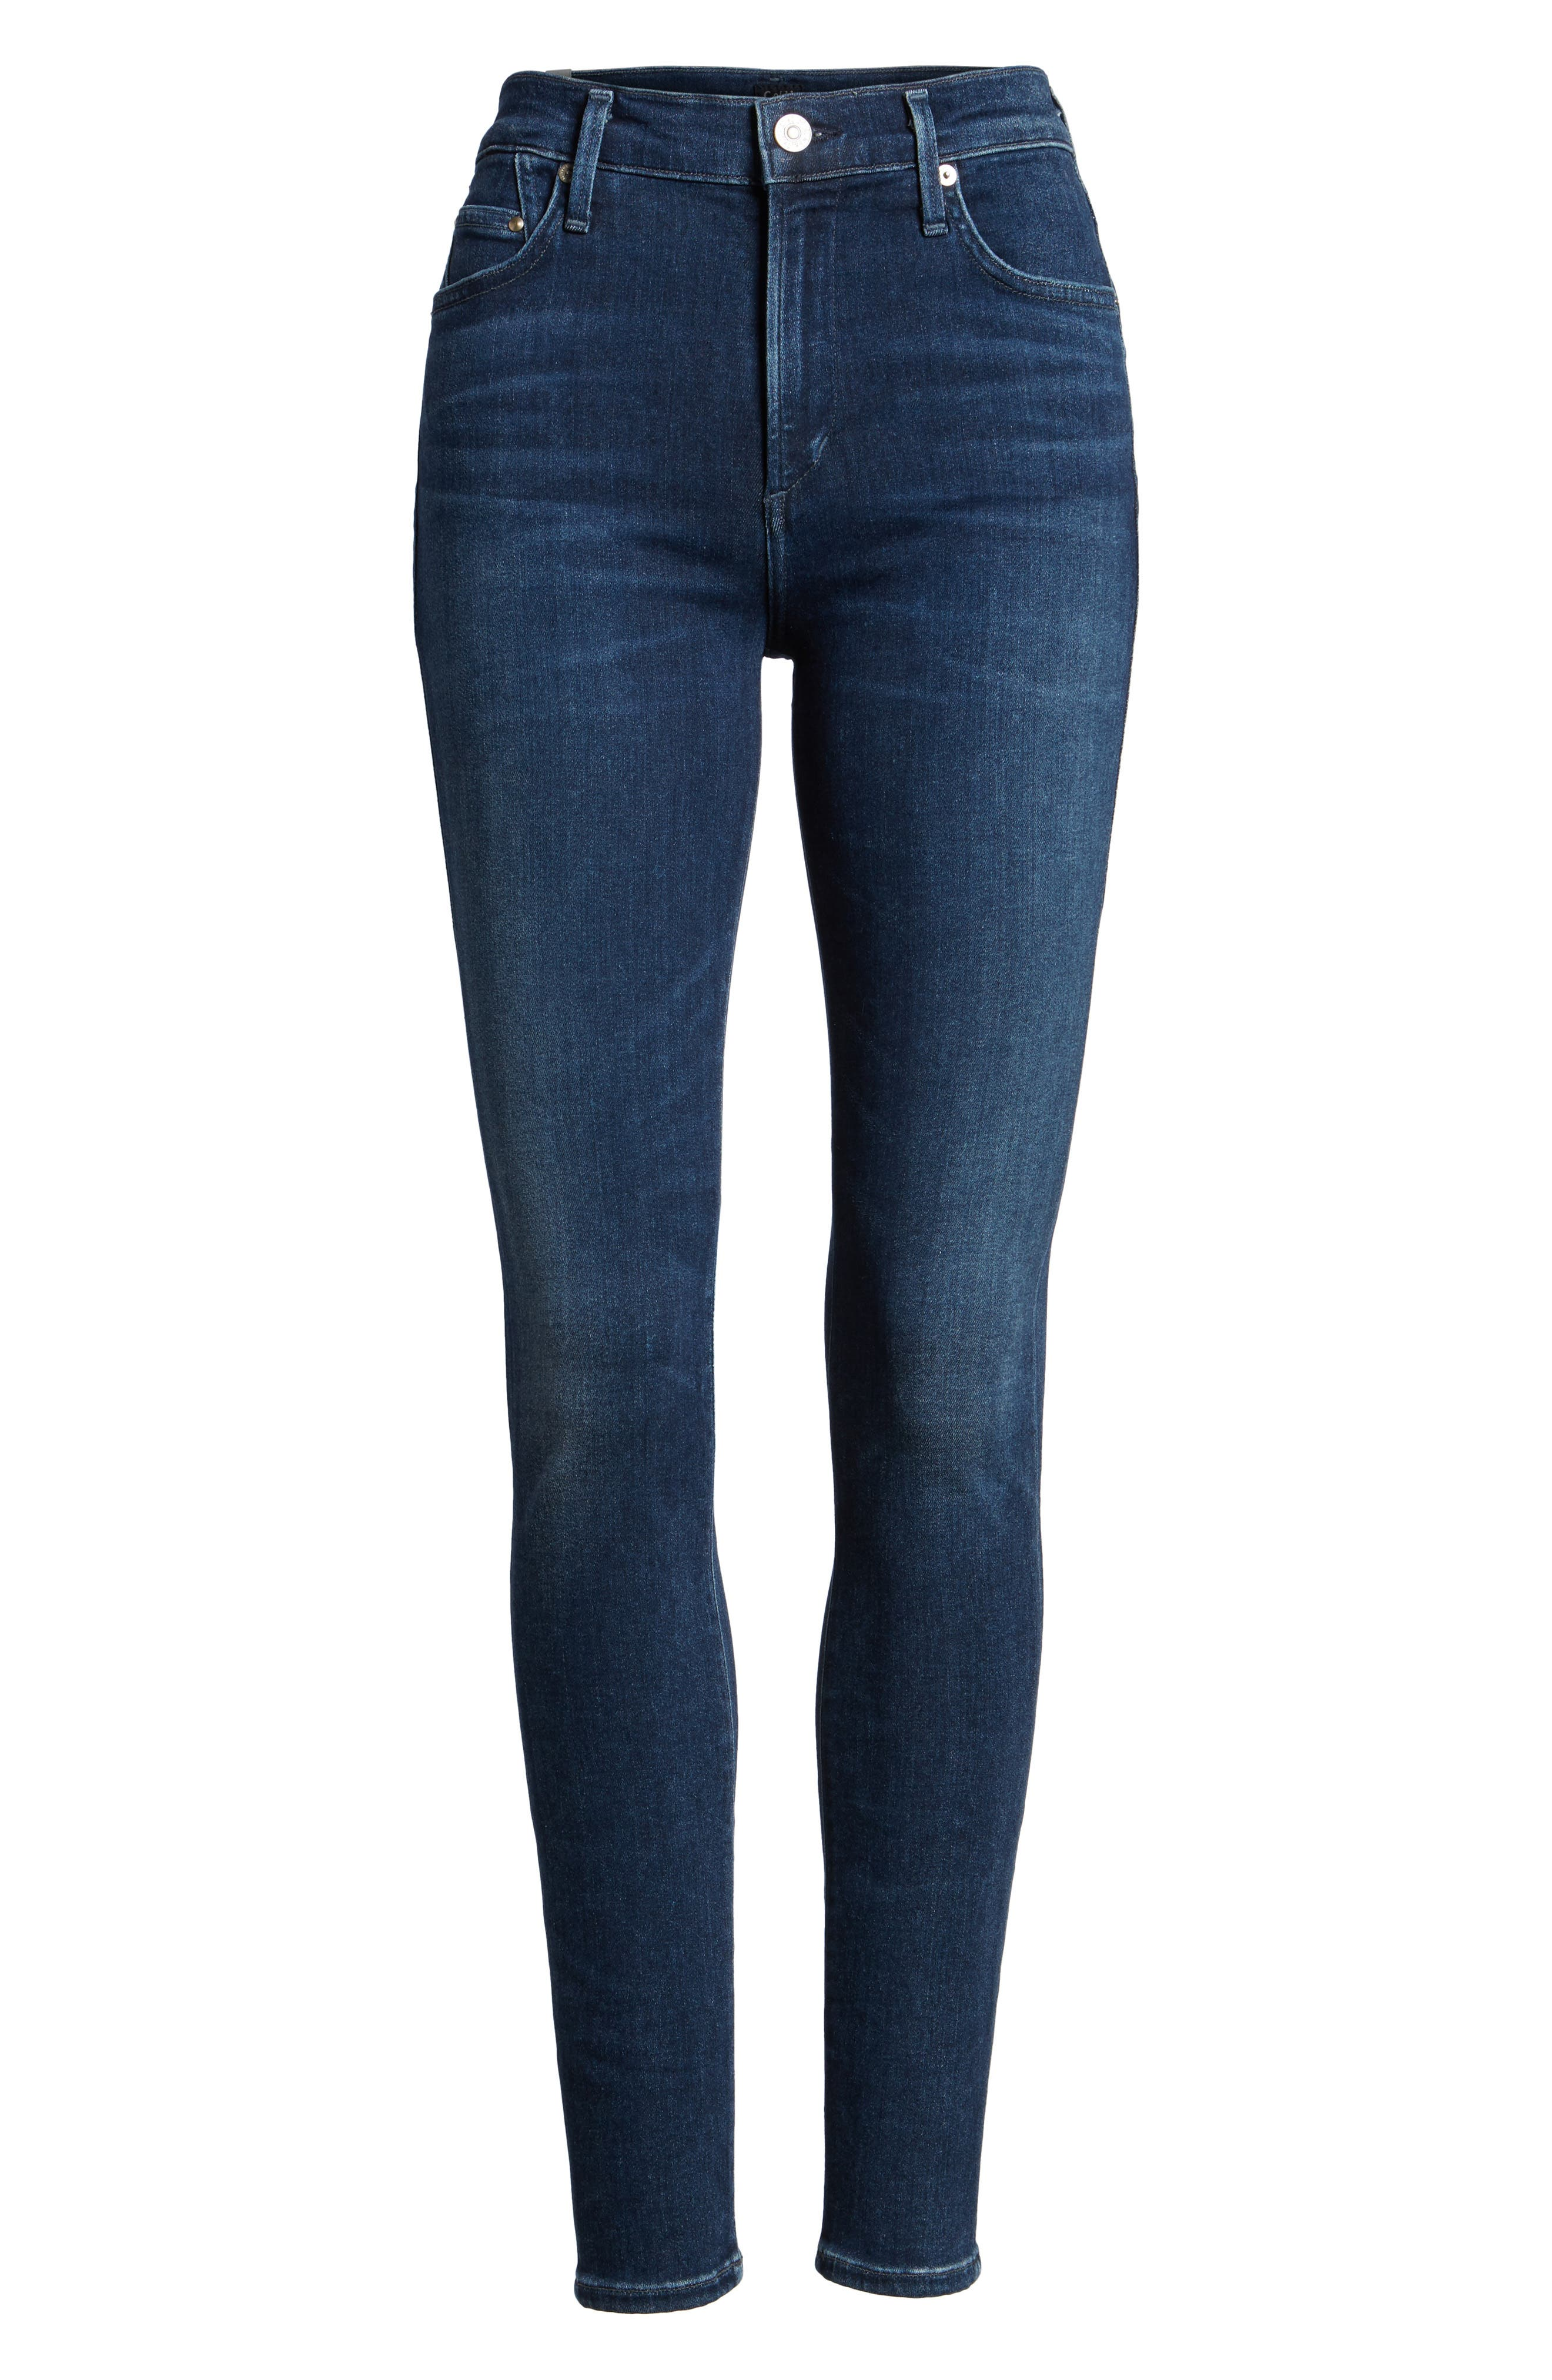 Sculpt - Rocket High Waist Skinny Jeans,                             Alternate thumbnail 3, color,                             WAVERLY